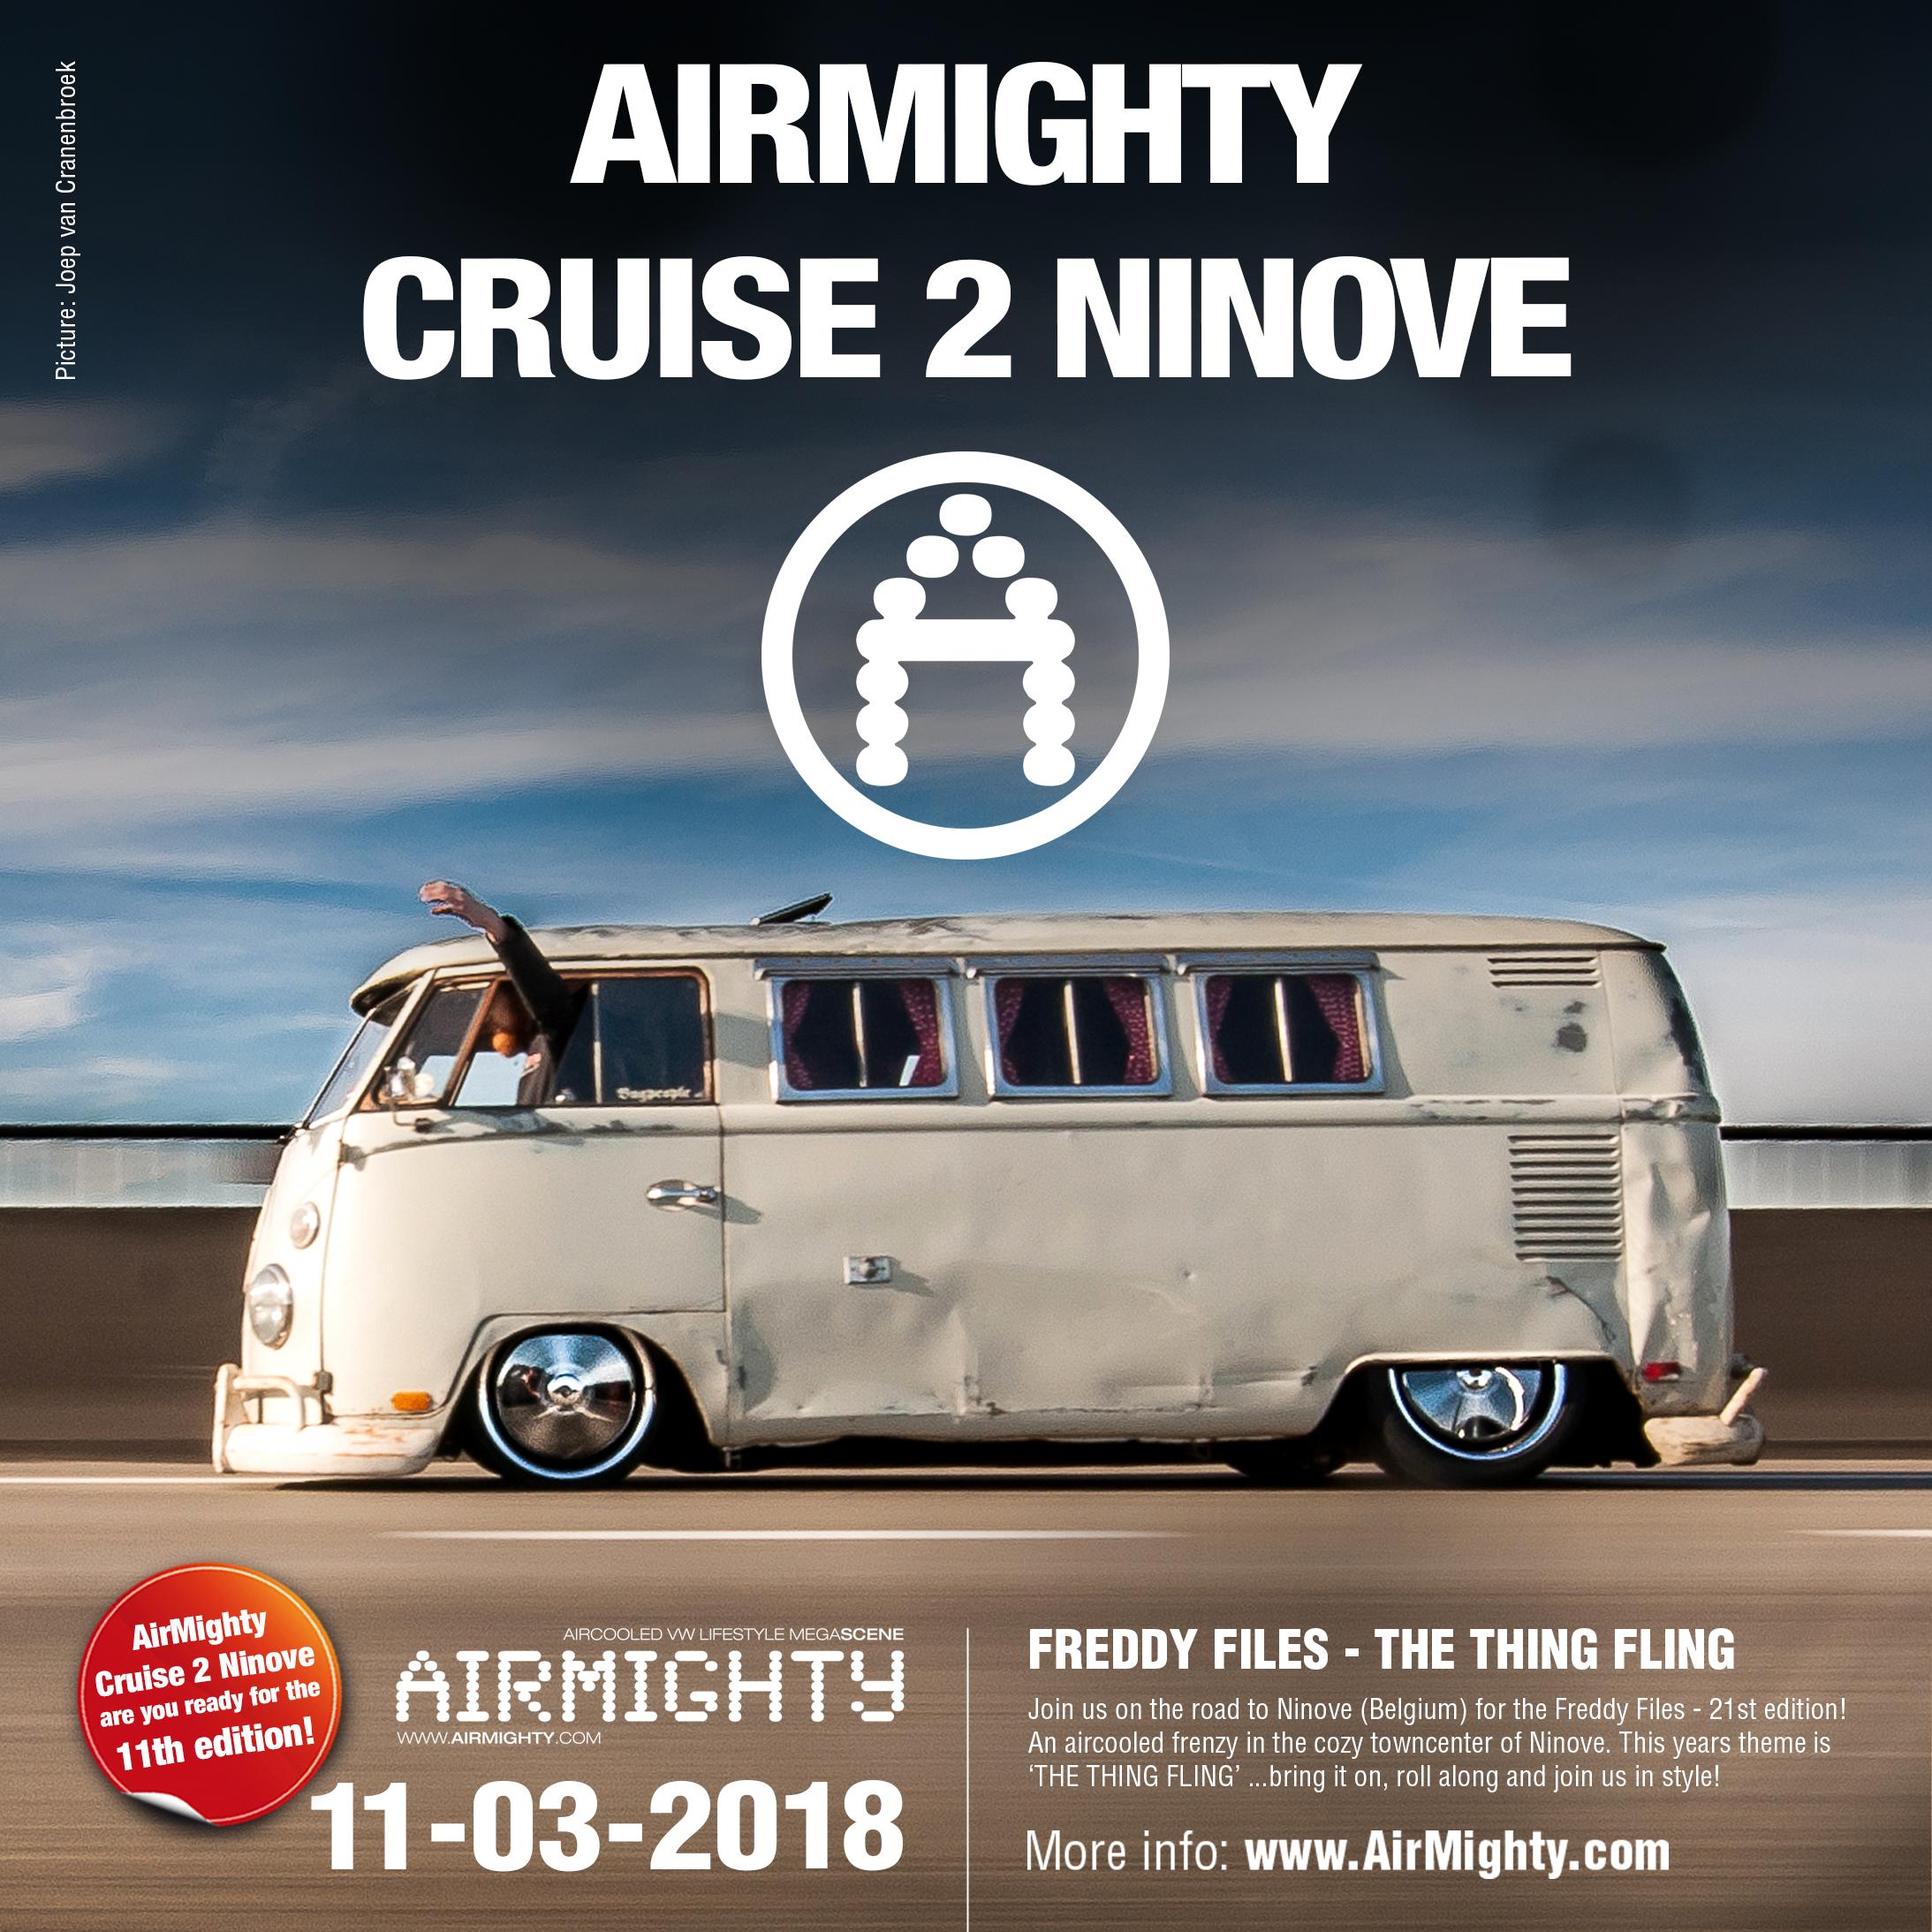 AirMighty Cruise 2 Ninove